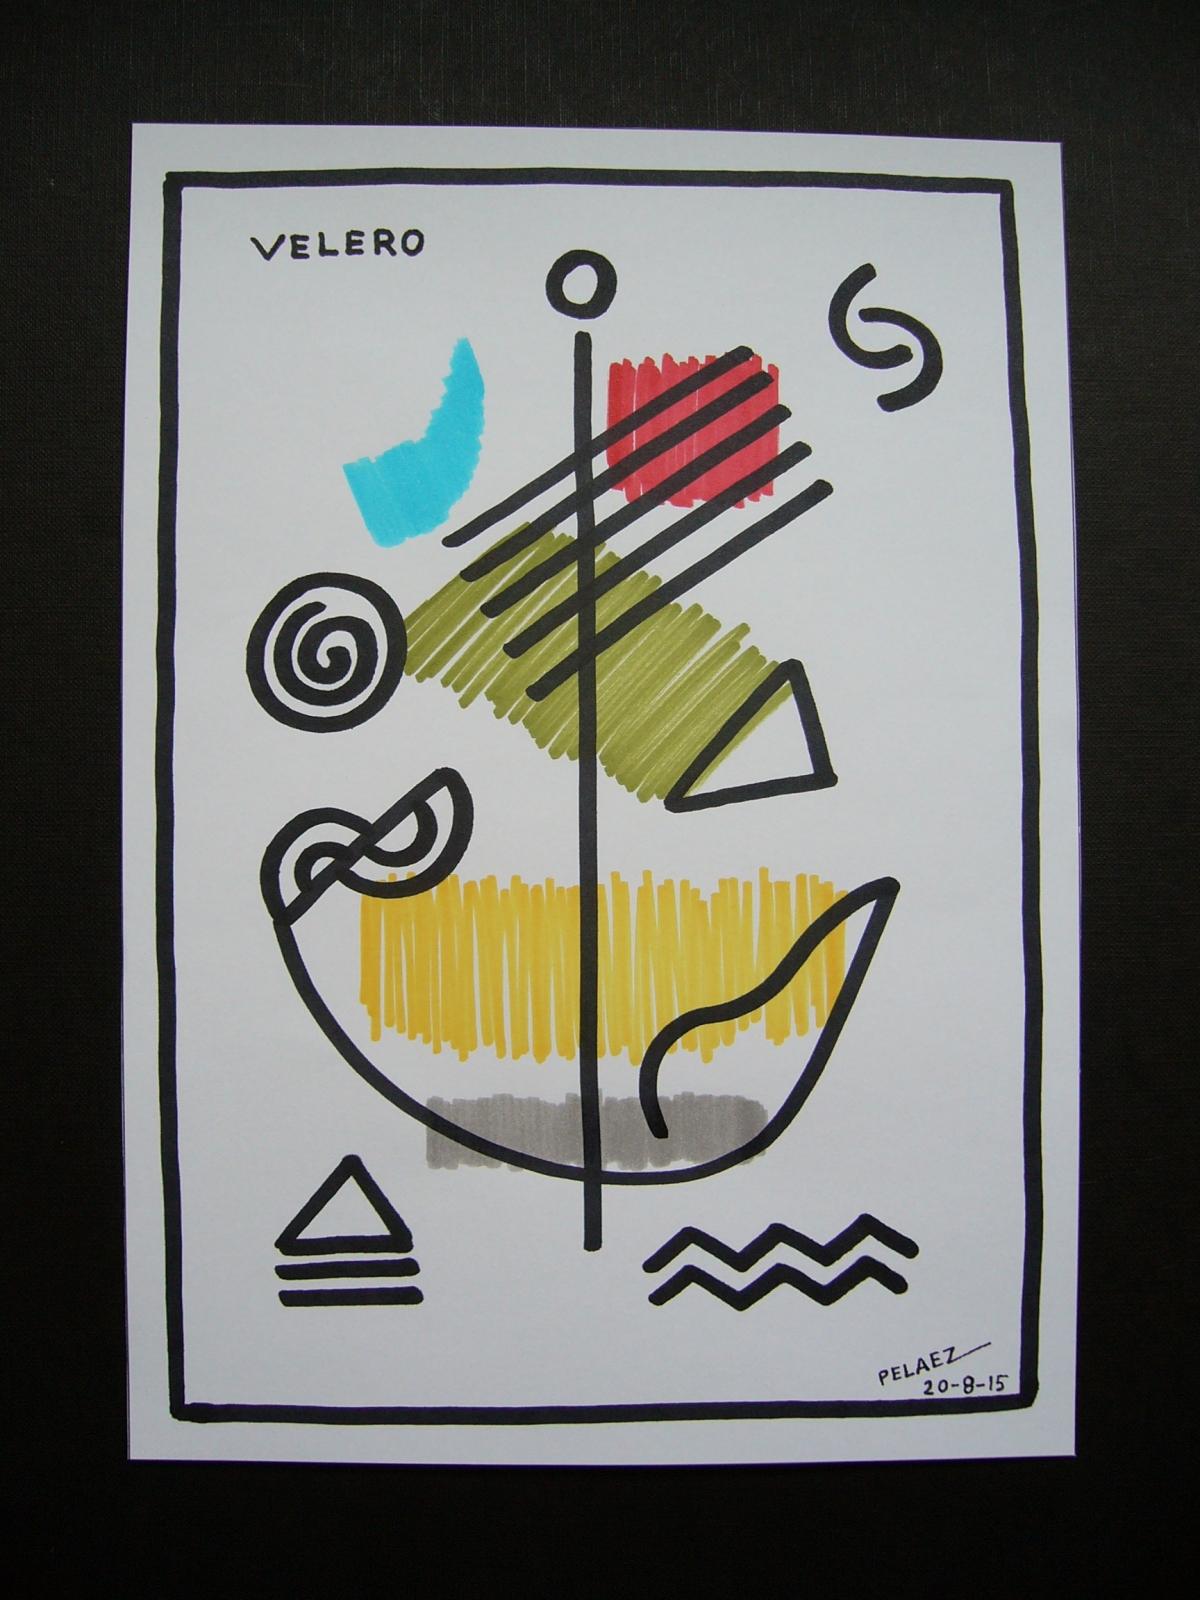 SKETCH(DIBUJO ESPONTANEO)